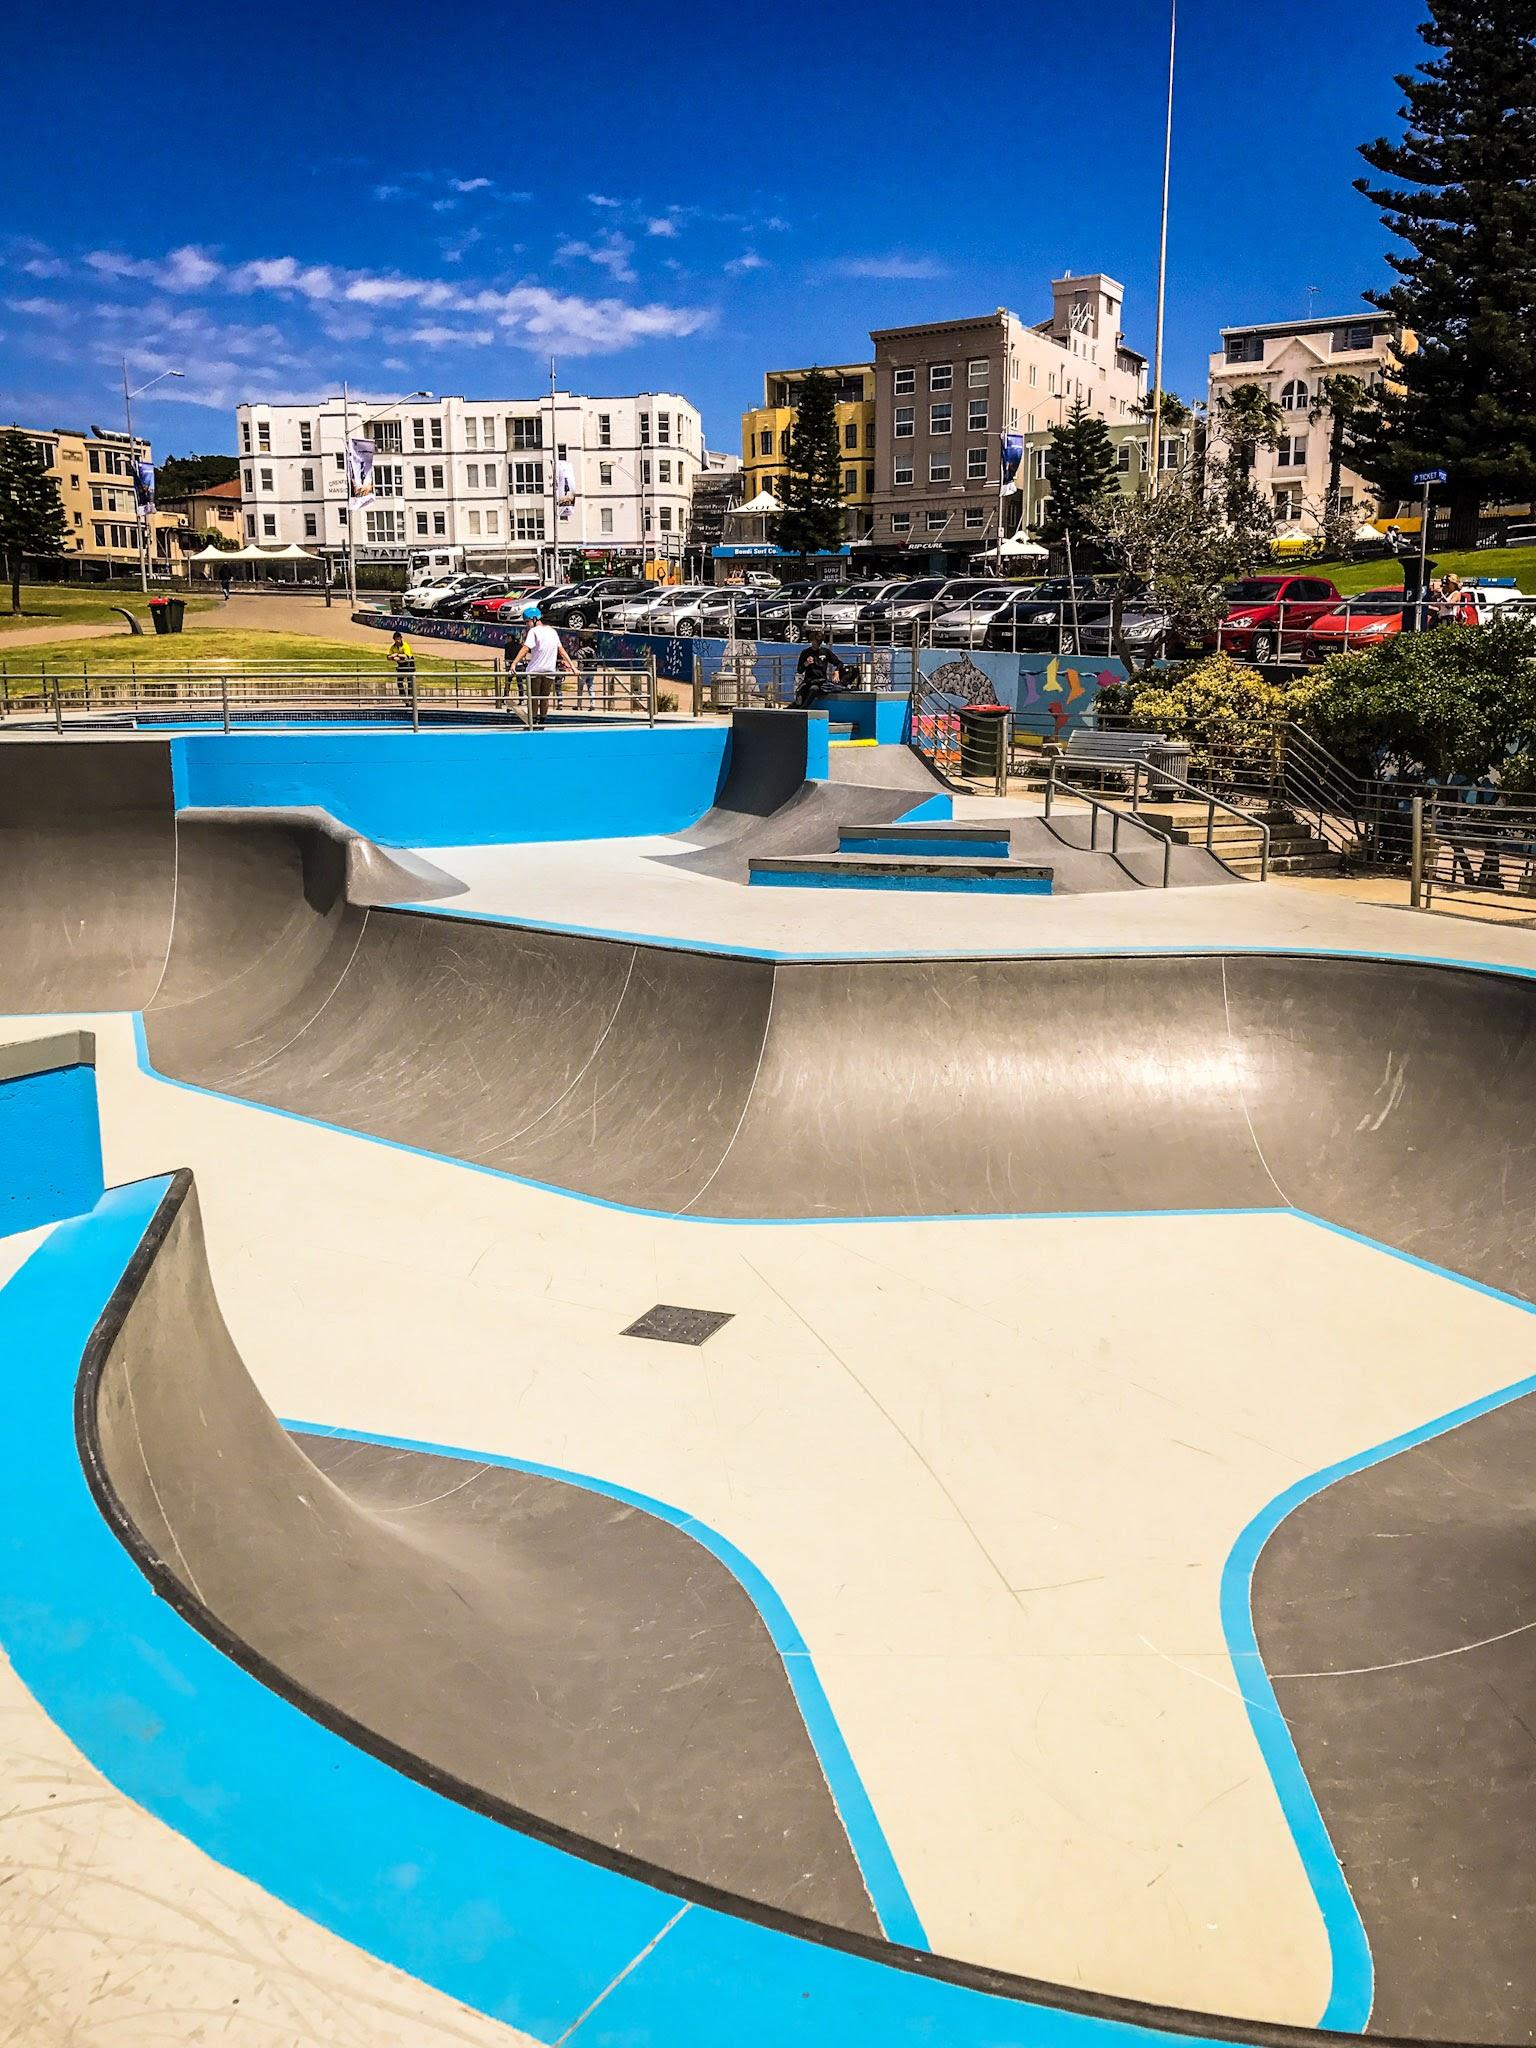 Want to skate ?  Skate Park Bondi Beach, Sydney